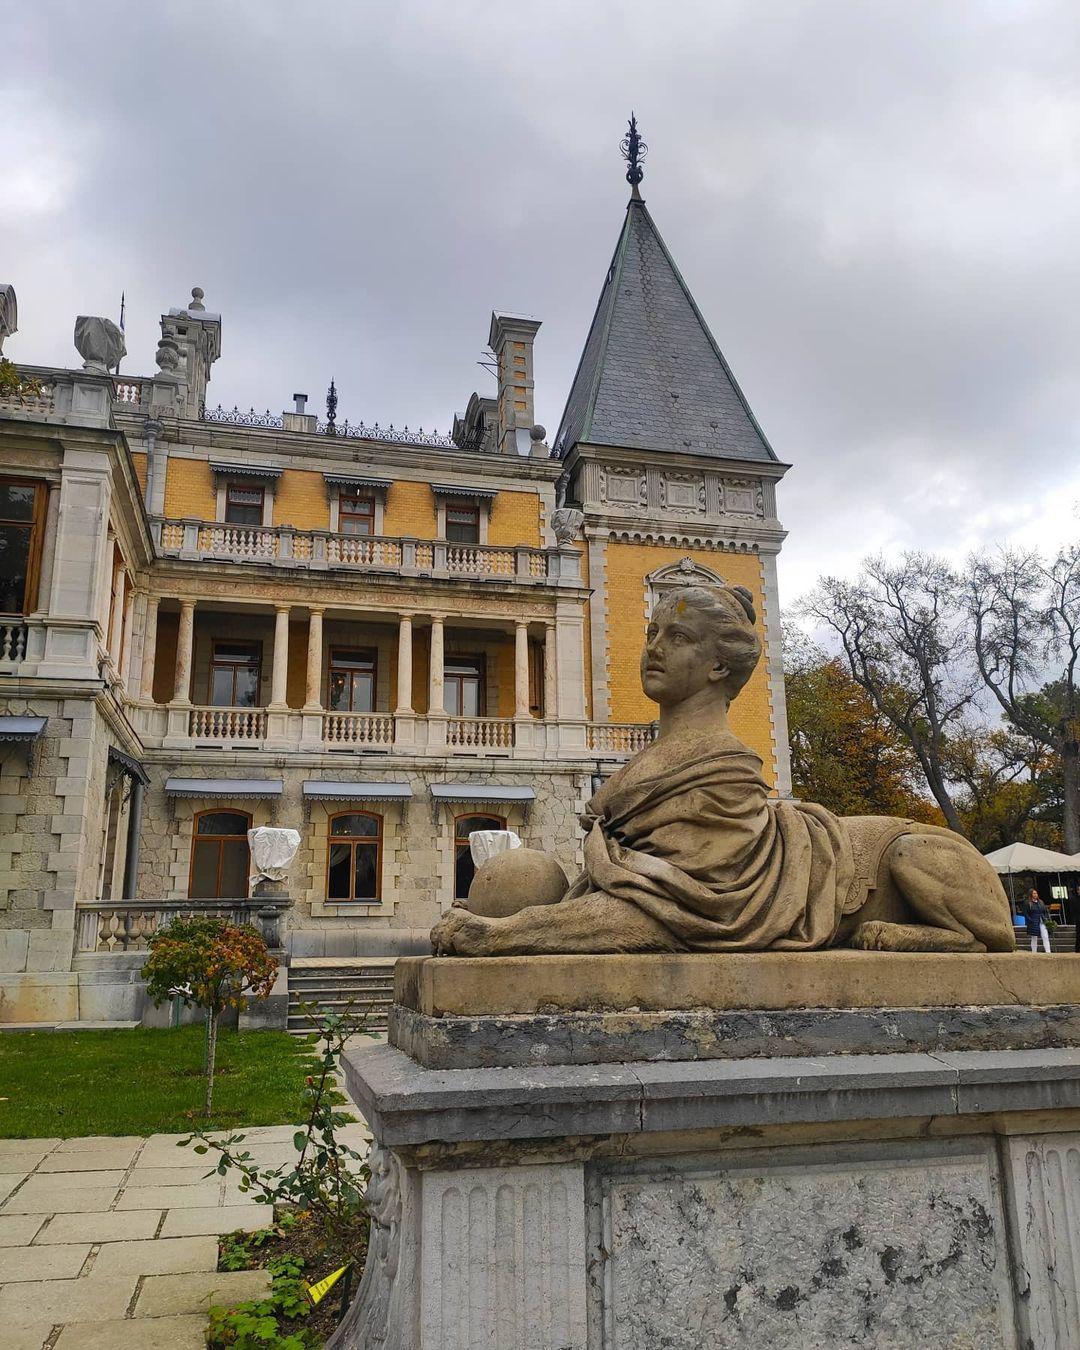 Статуя и дворец